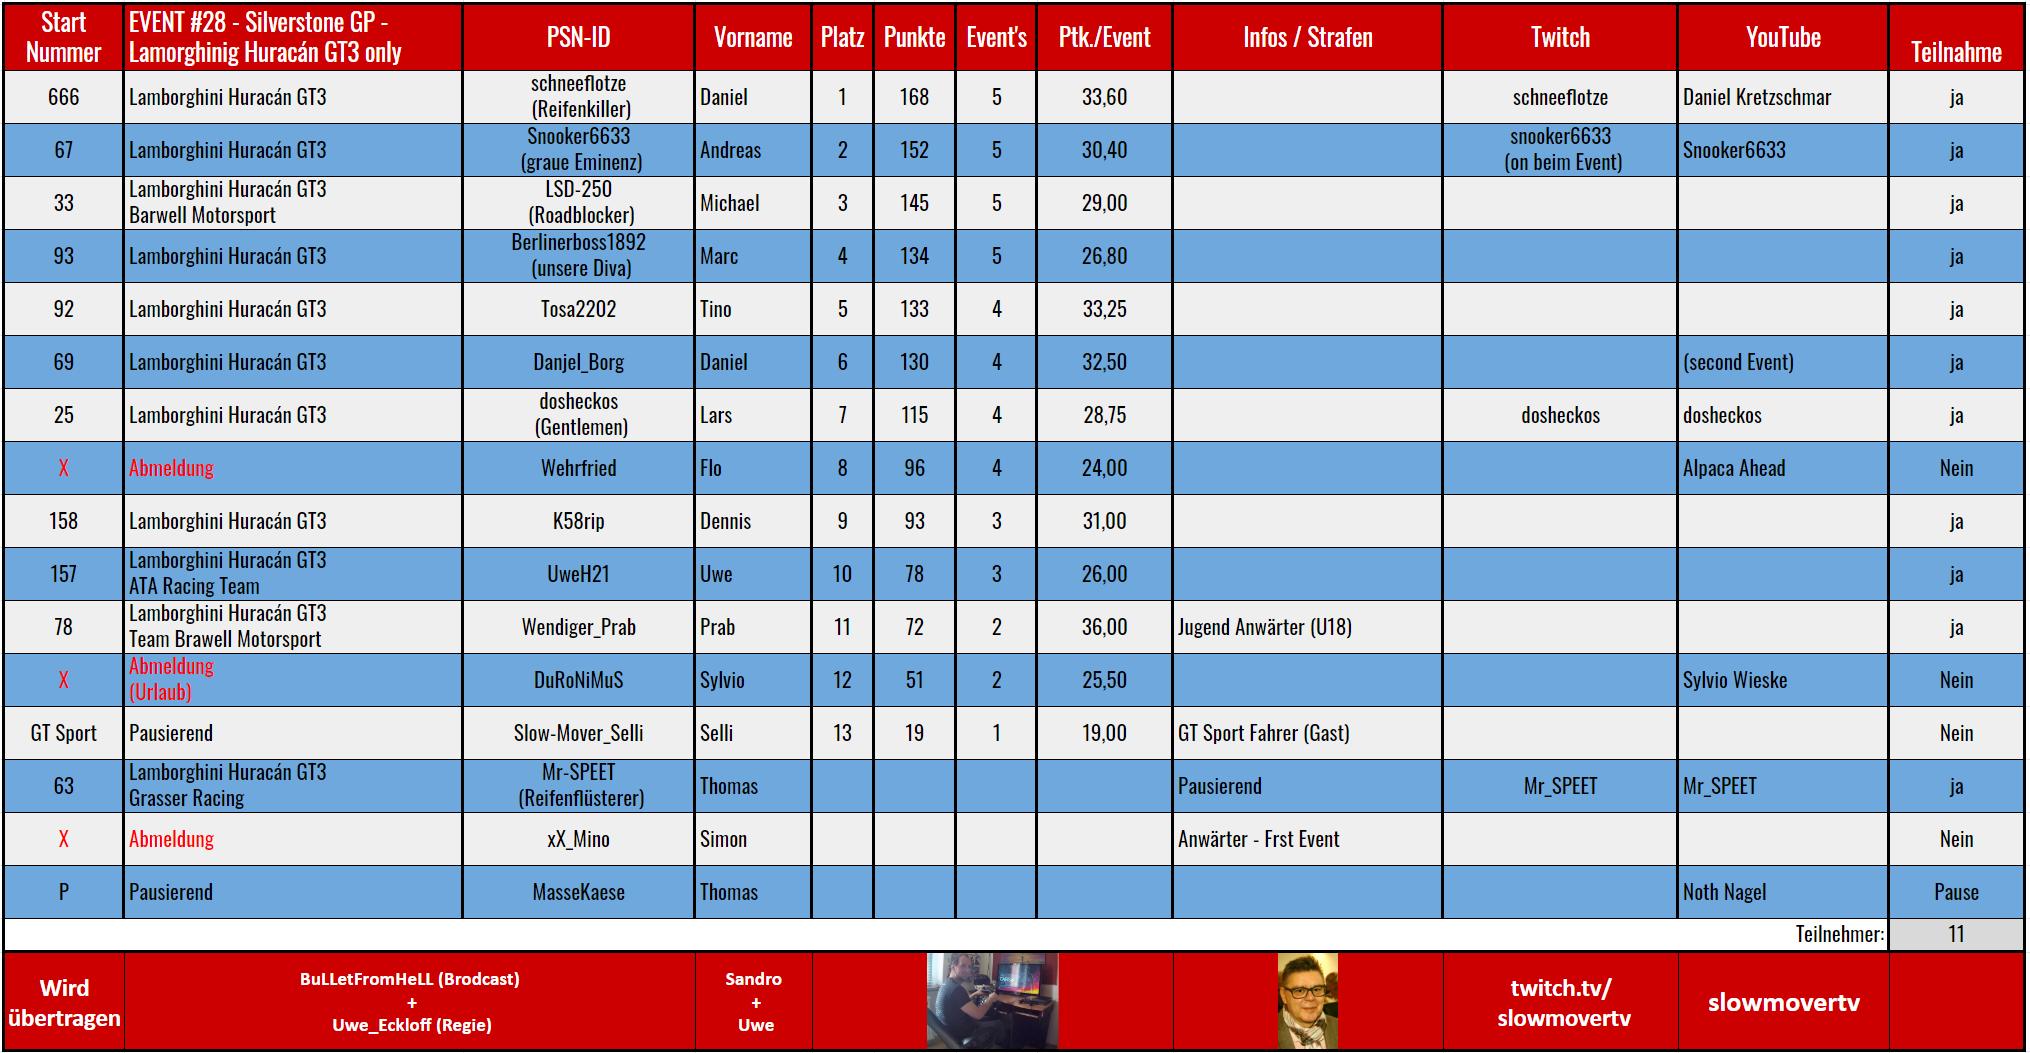 028 Silverstone GP - Huracán GT3 - Wendiger_Prab / LSD250 (20.10.2019)